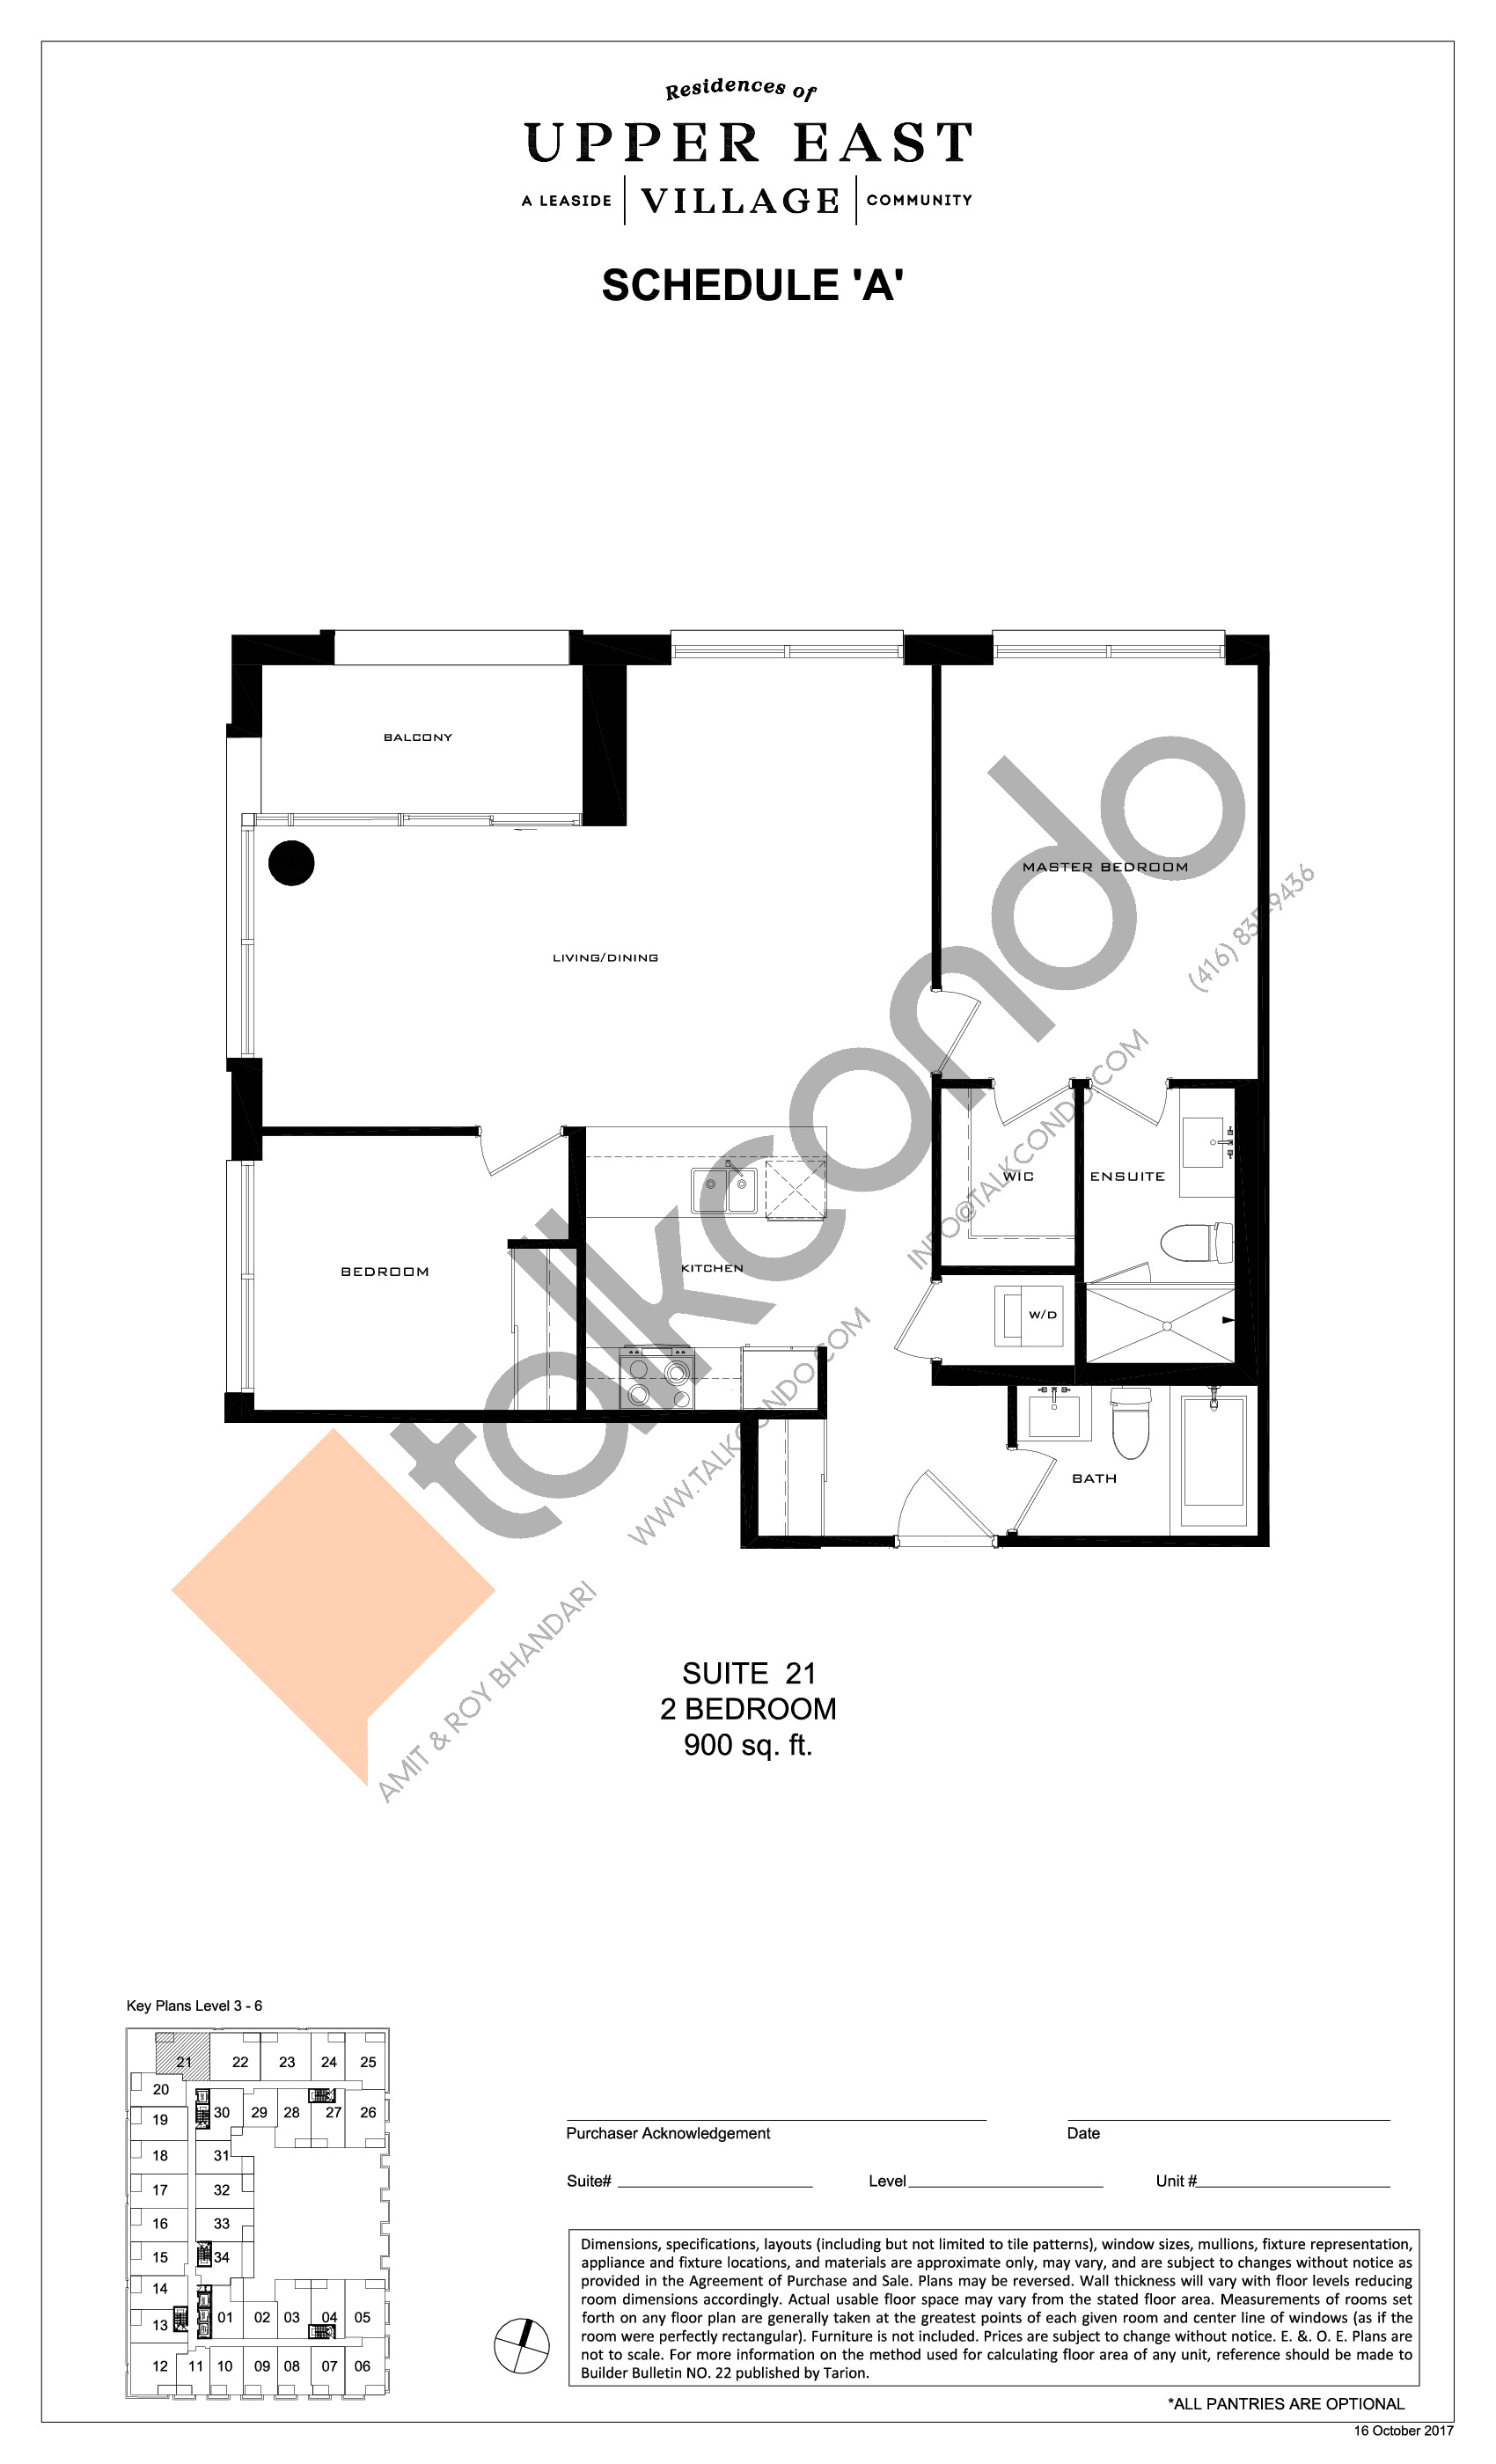 Suite 21 Floor Plan at Upper East Village Condos - 900 sq.ft